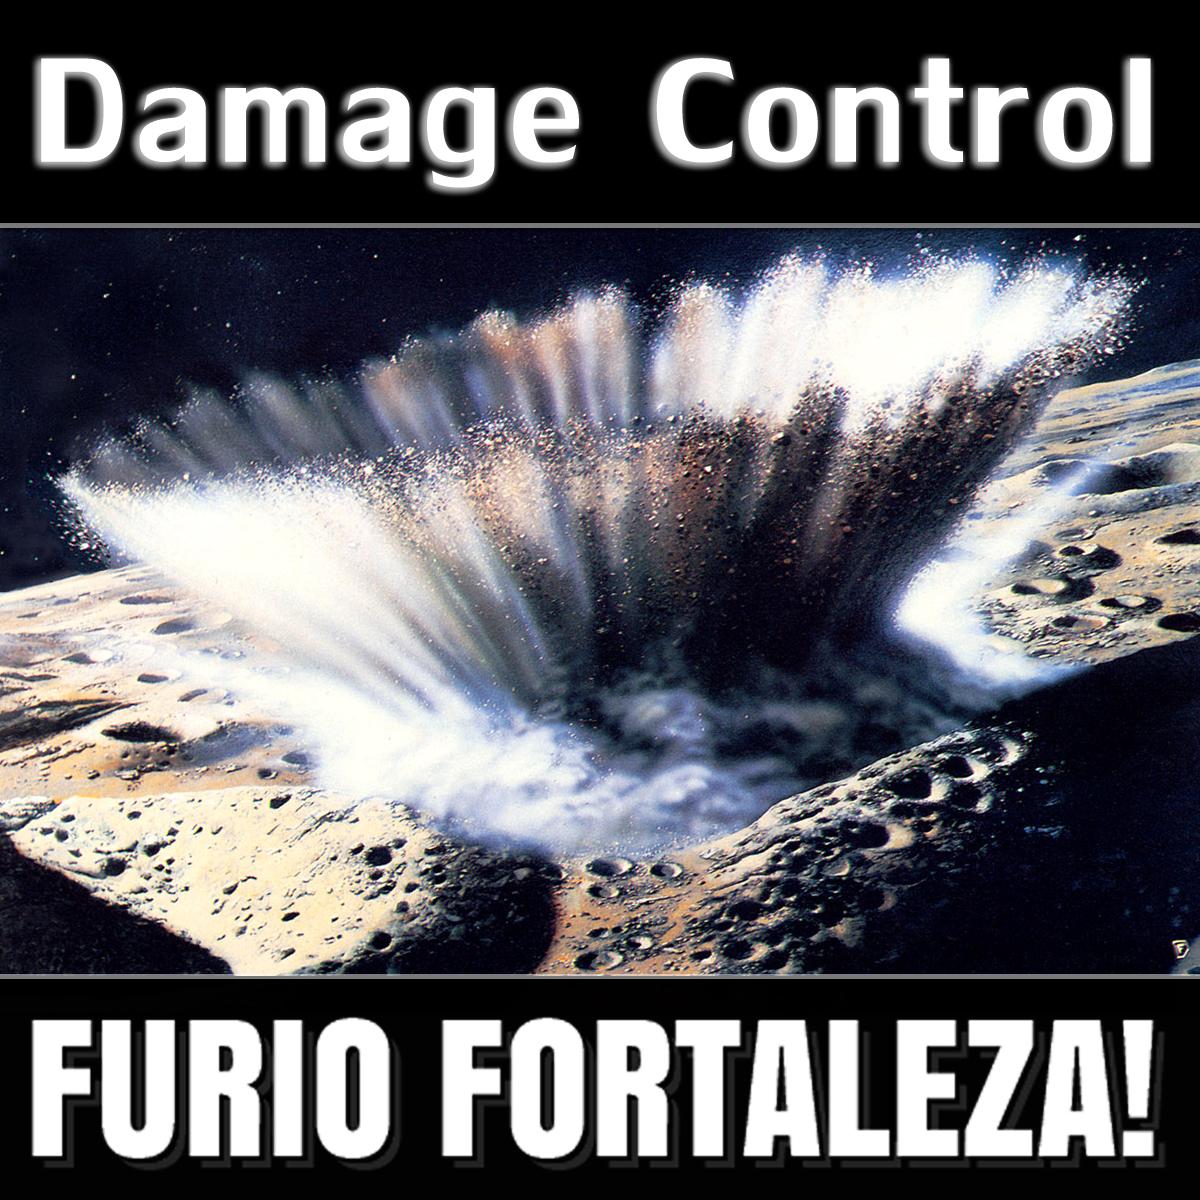 Furio Fortaleza! - 3.9 - Damage Control